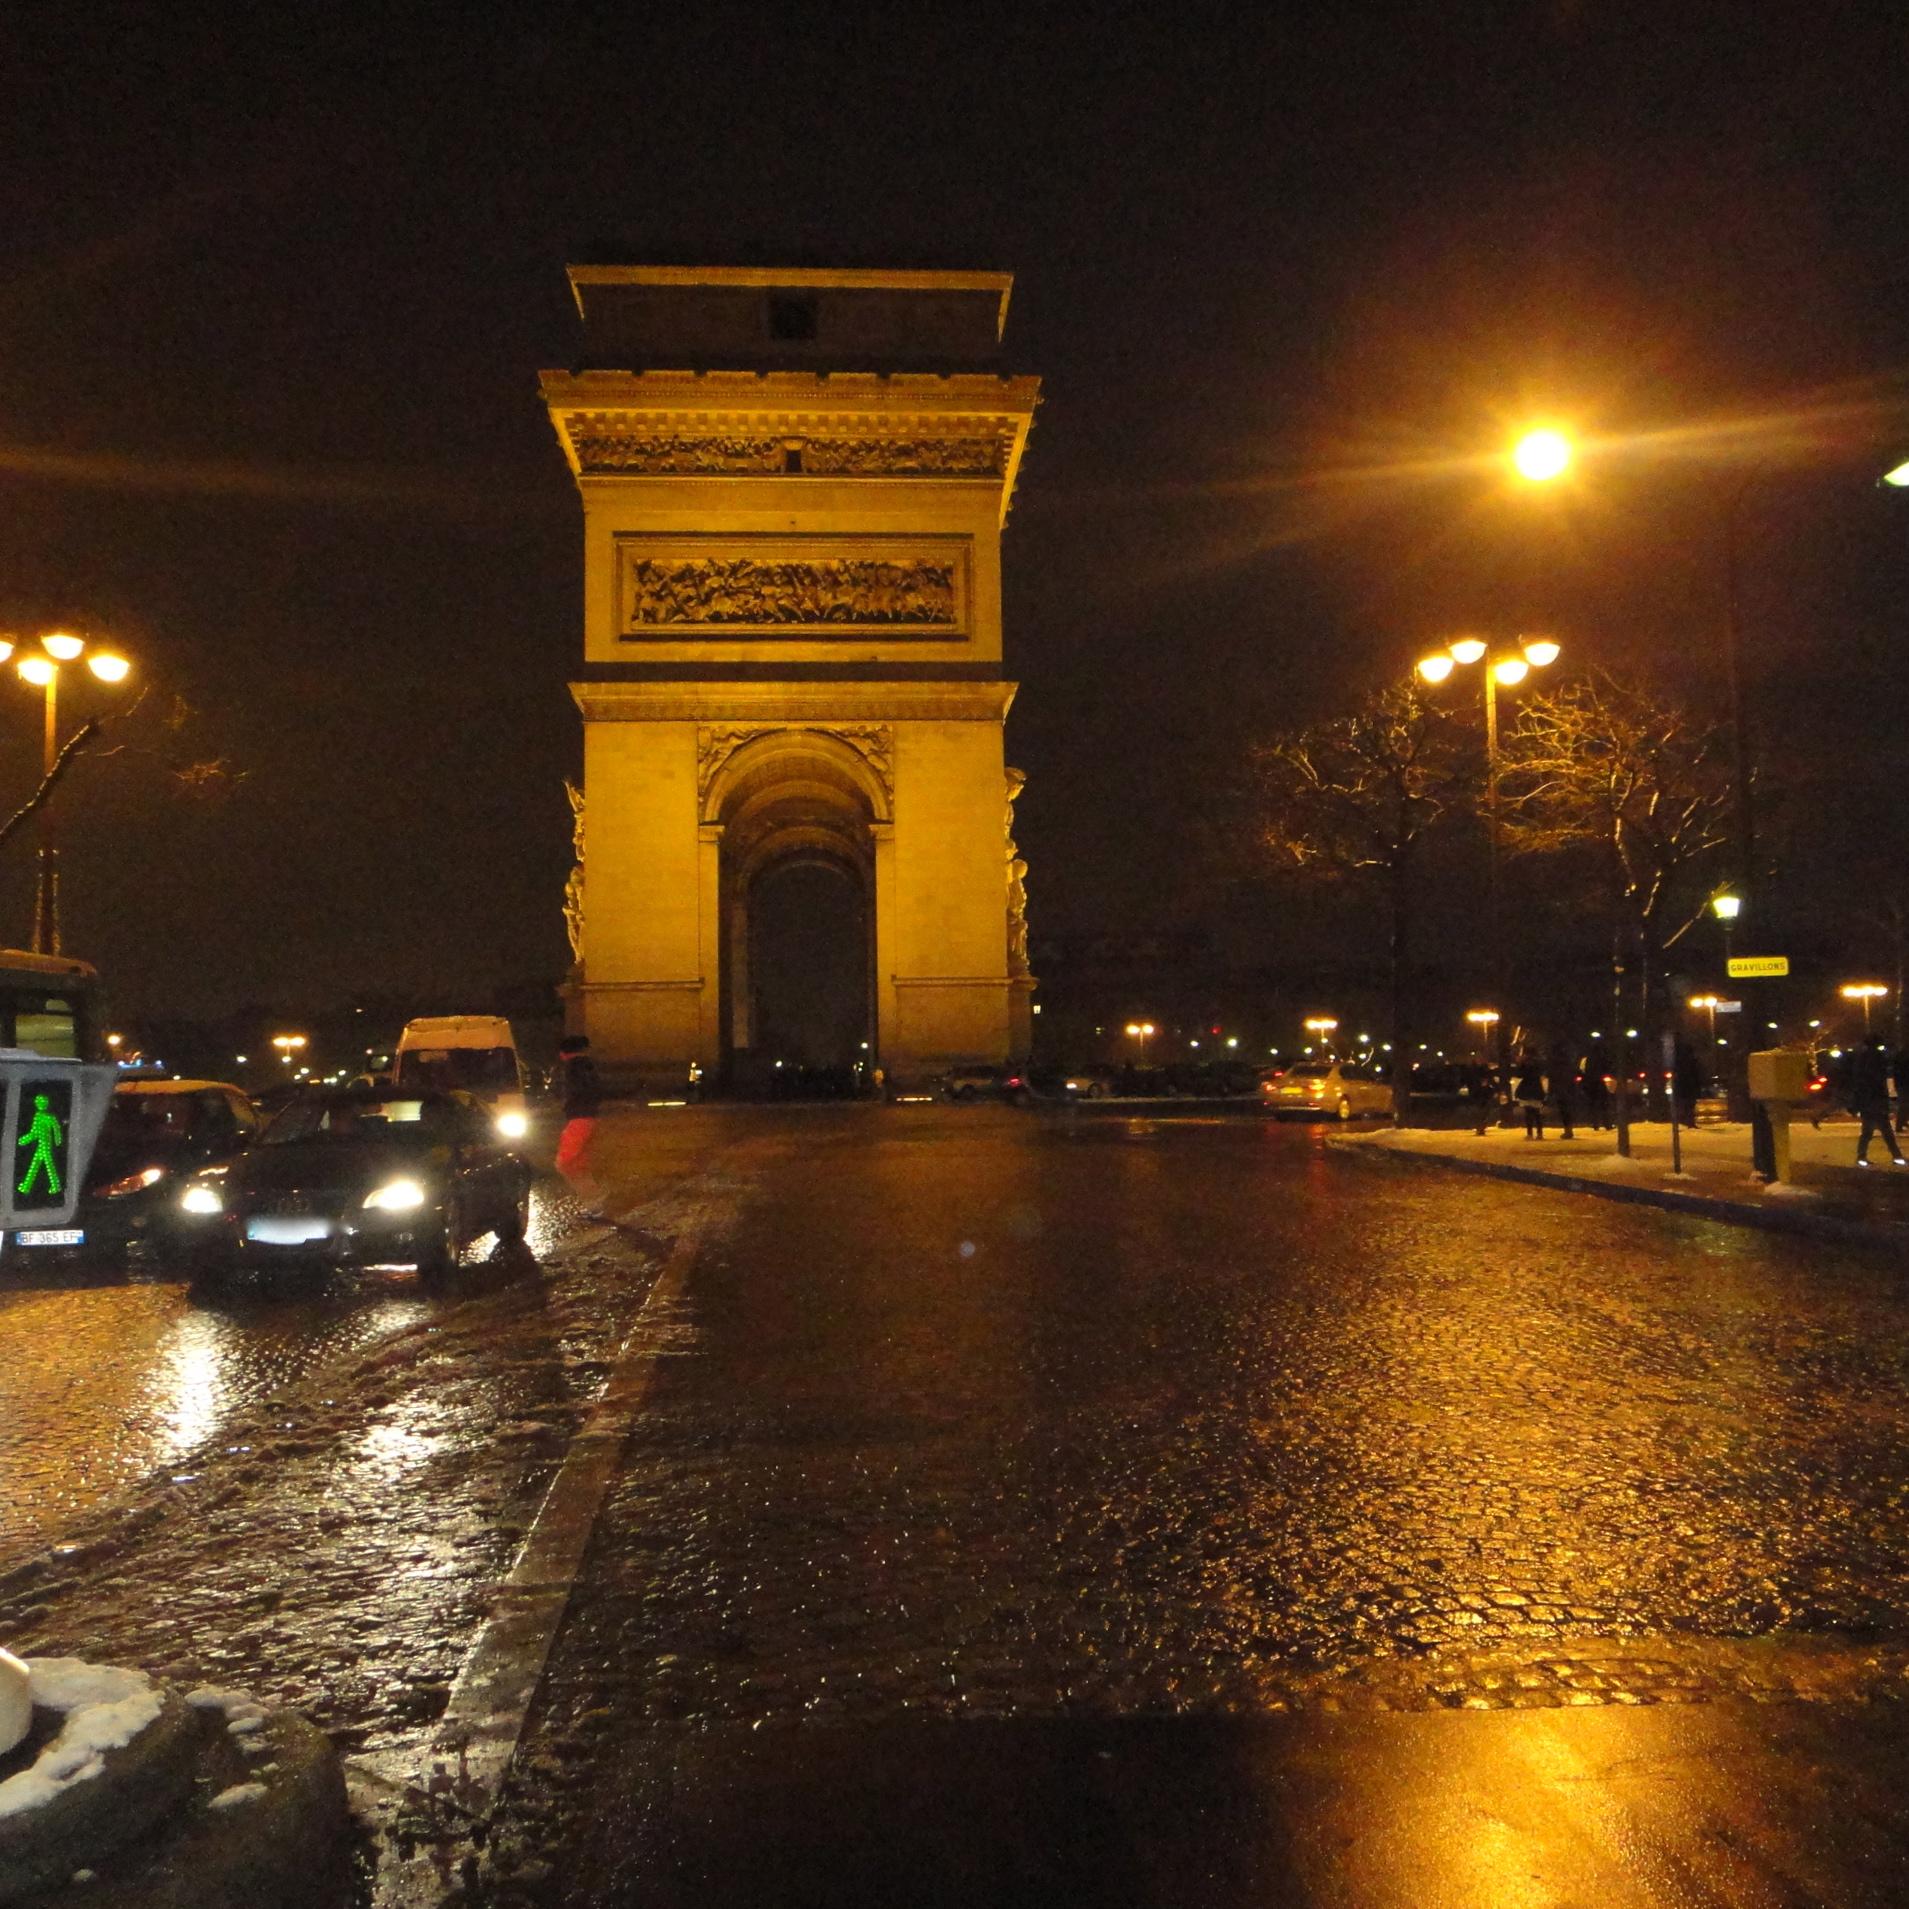 l'Arc de Triomphe - side view / Seitenansicht